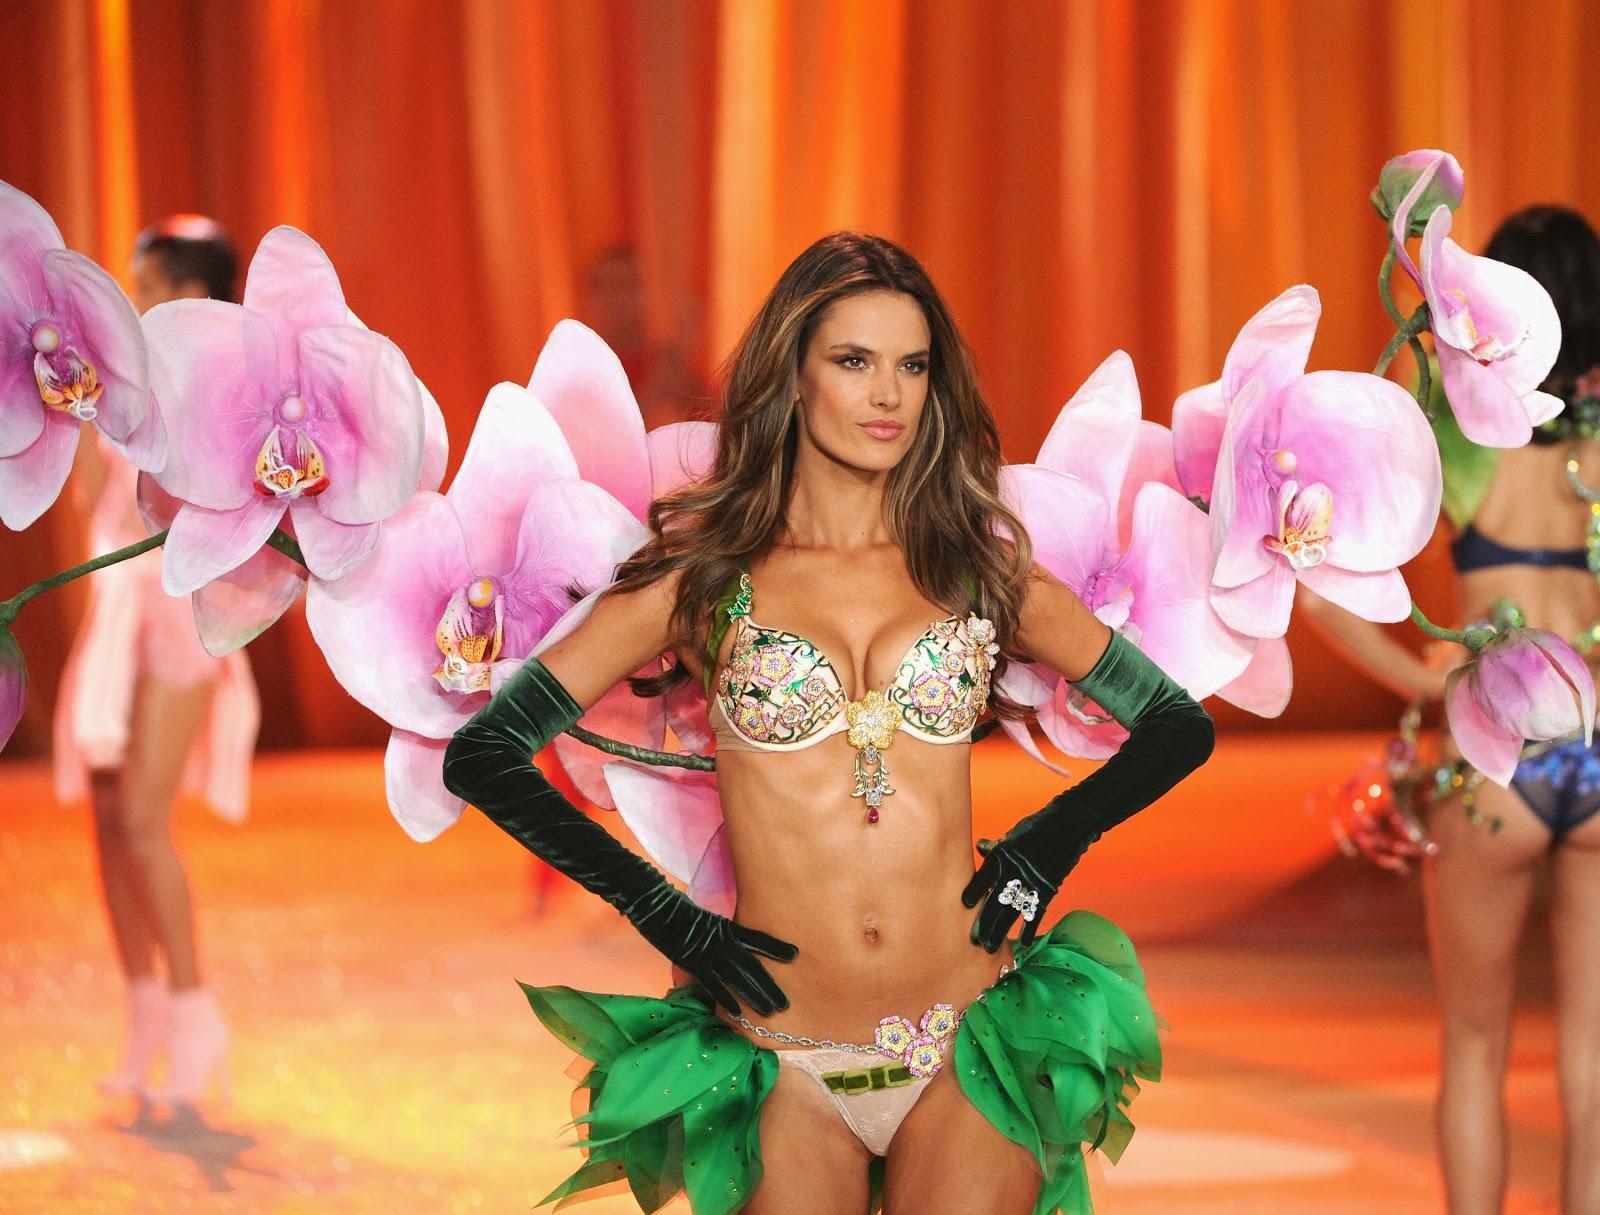 http://3.bp.blogspot.com/-1bjLA6ylWzI/UJw_0A1mHiI/AAAAAAAAAy0/9UfrYjtQQcA/s1600/85243_alessandra_ambrosio_2012_victorias_secret_fashion_show_20121107_009_122_356lo.jpg